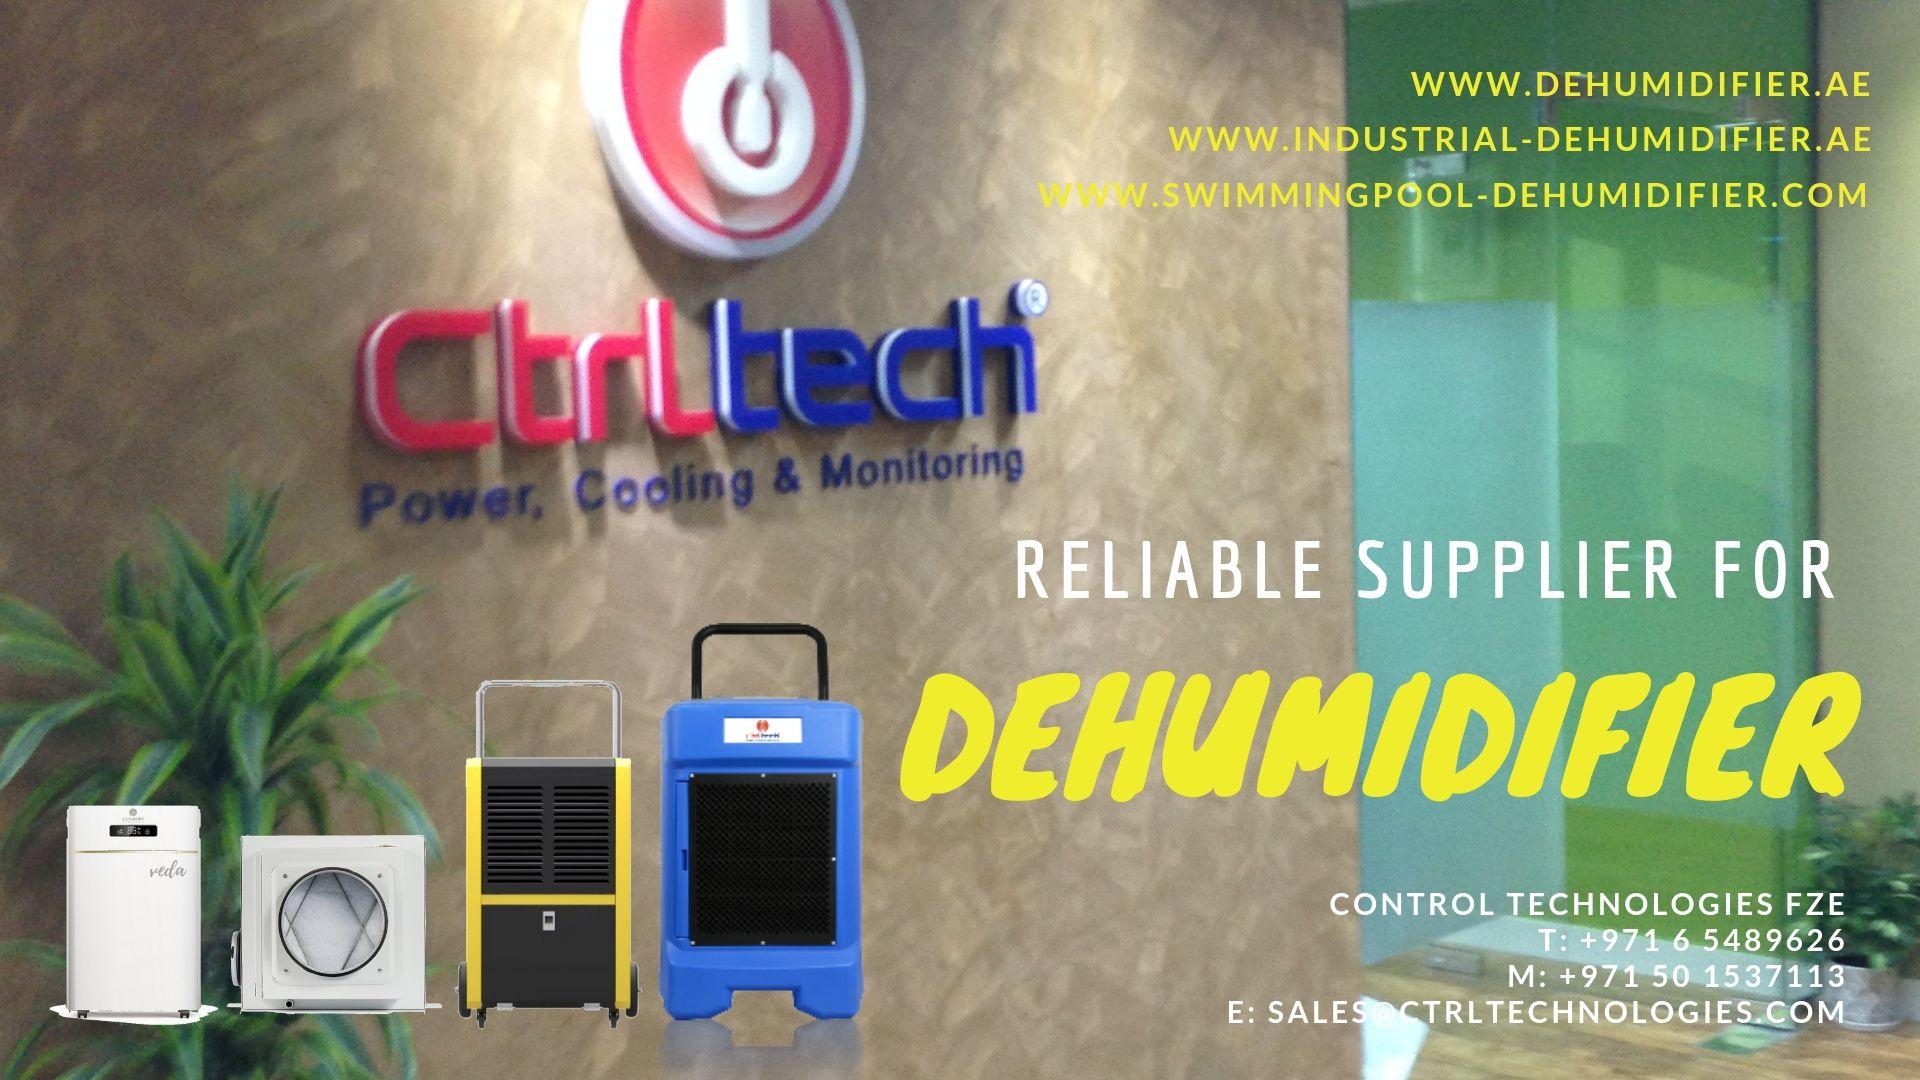 Dehumidifier Supplier In Dubai Uae Oman Qatar And Saudi Arabia Dehumidifiers Dubai Oman